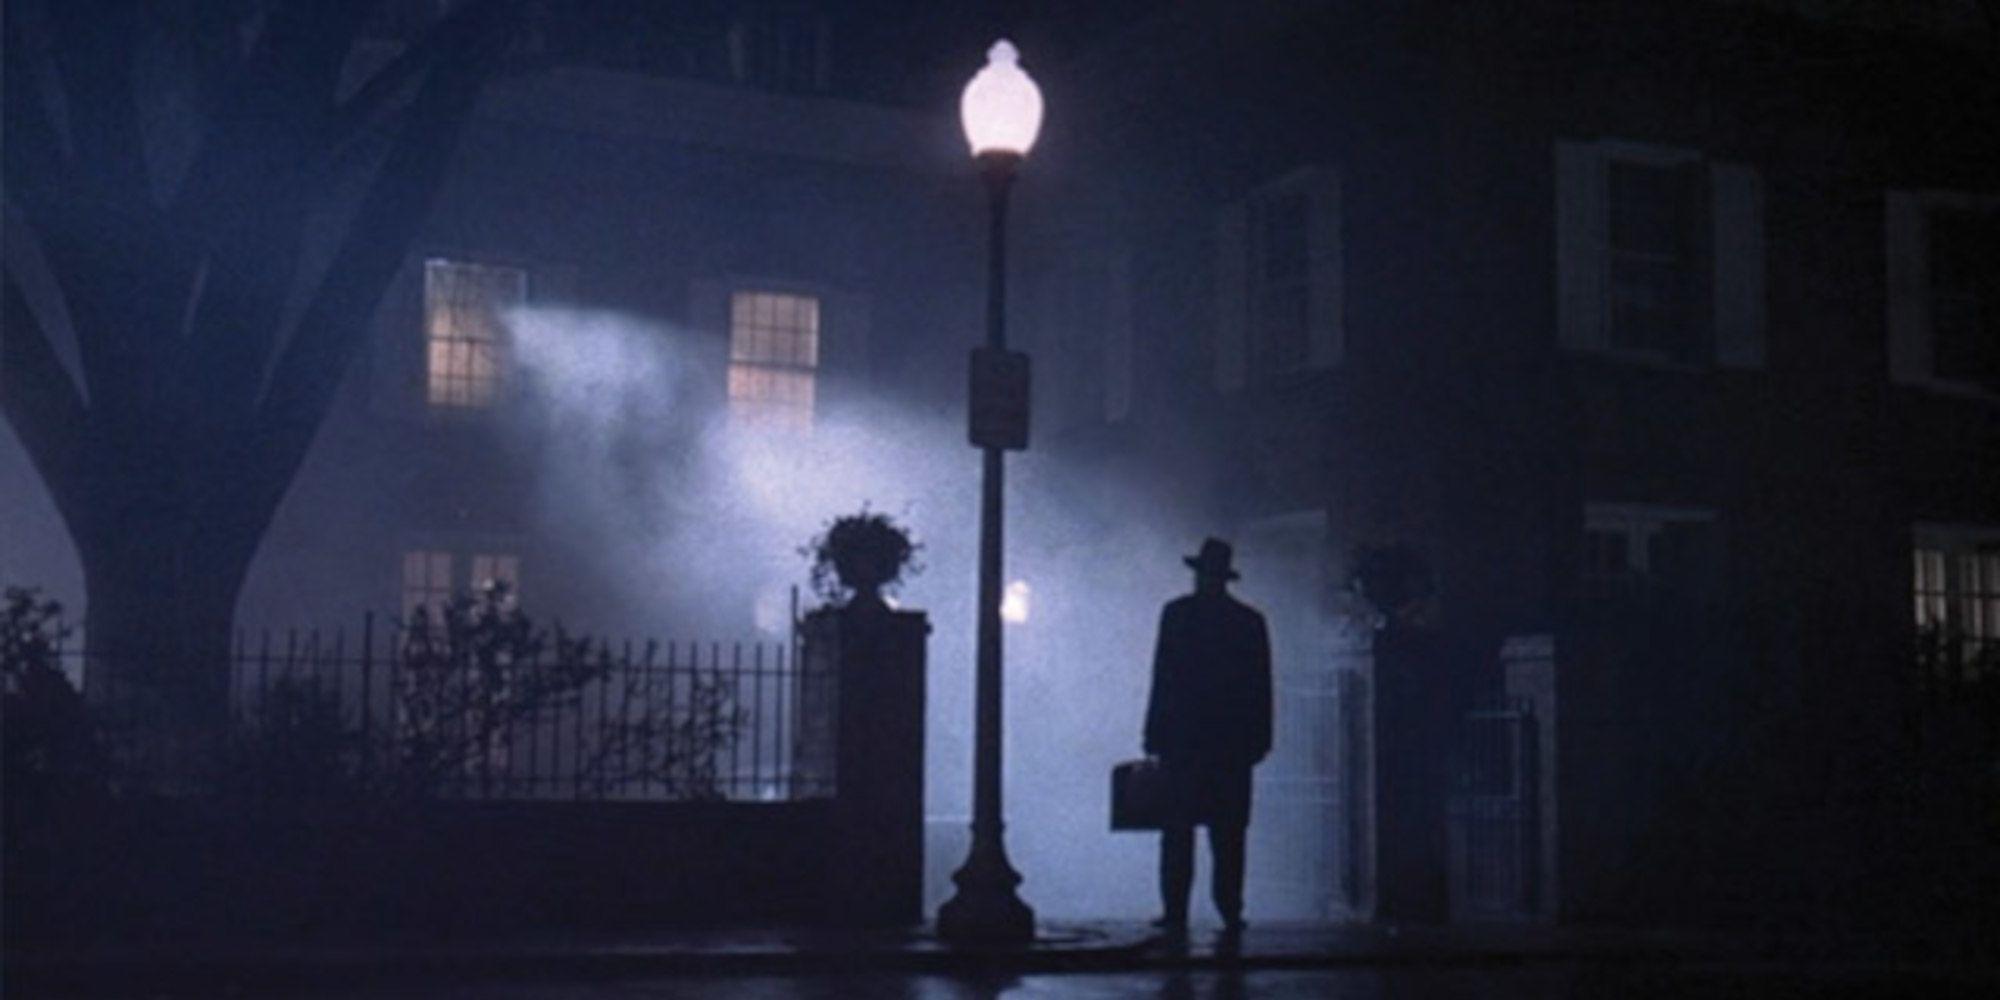 REPORT: Blumhouse Eyes David Gordon Green to Direct Exorcist Sequel